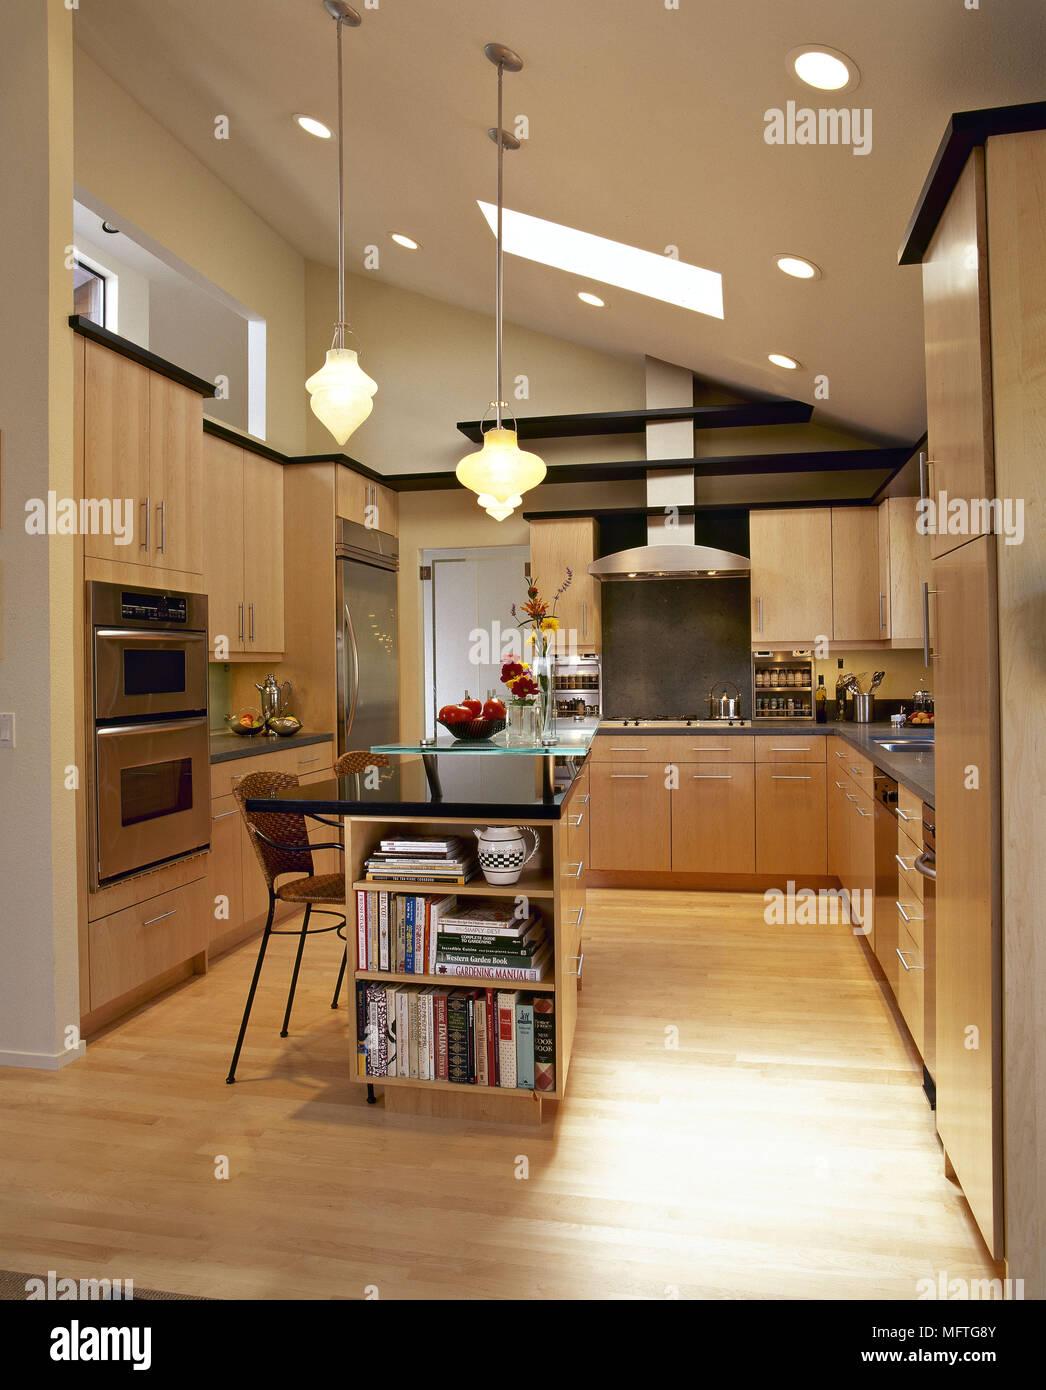 moderne k che mit holz und zentrale insel mit granit. Black Bedroom Furniture Sets. Home Design Ideas